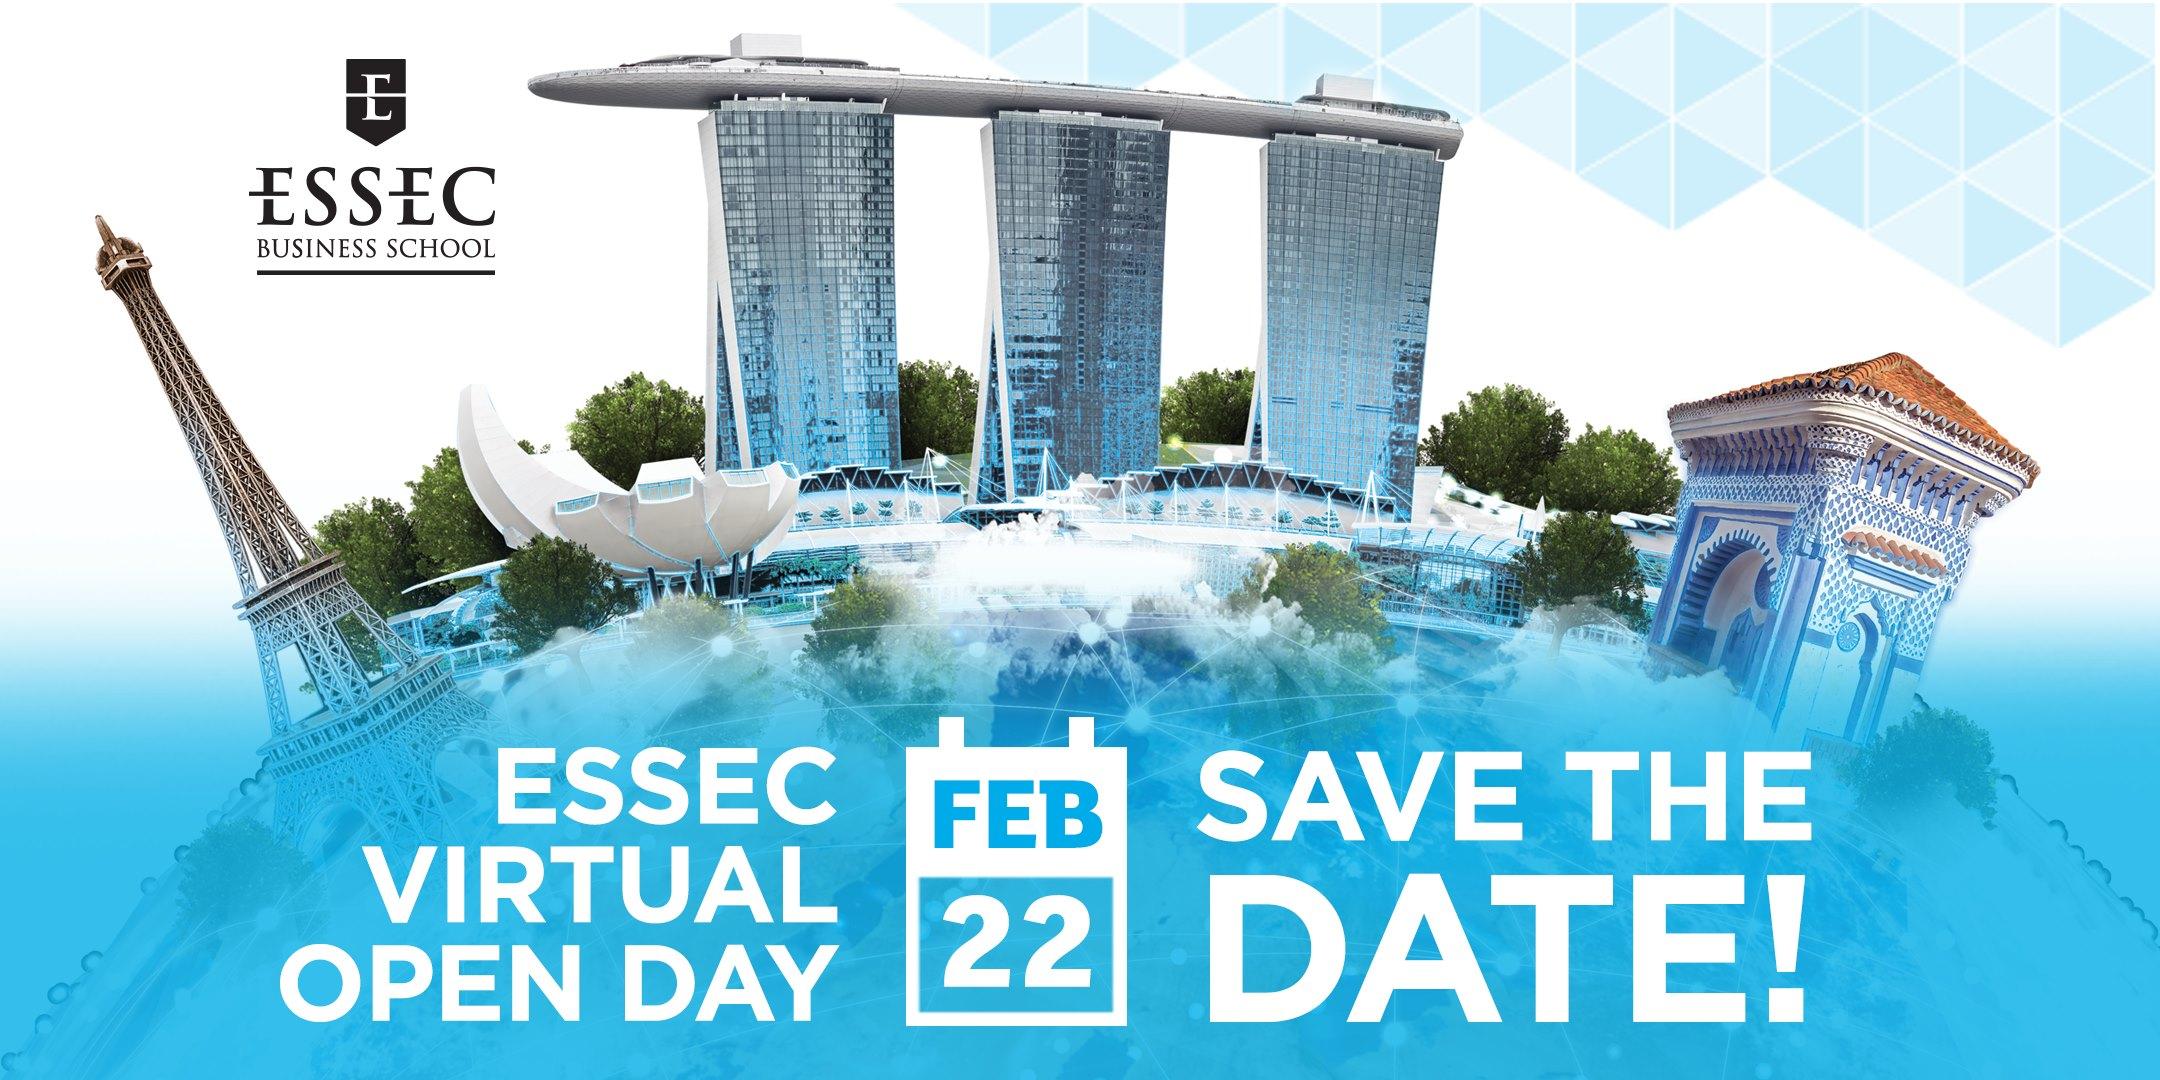 ESSEC Virtual Open Day